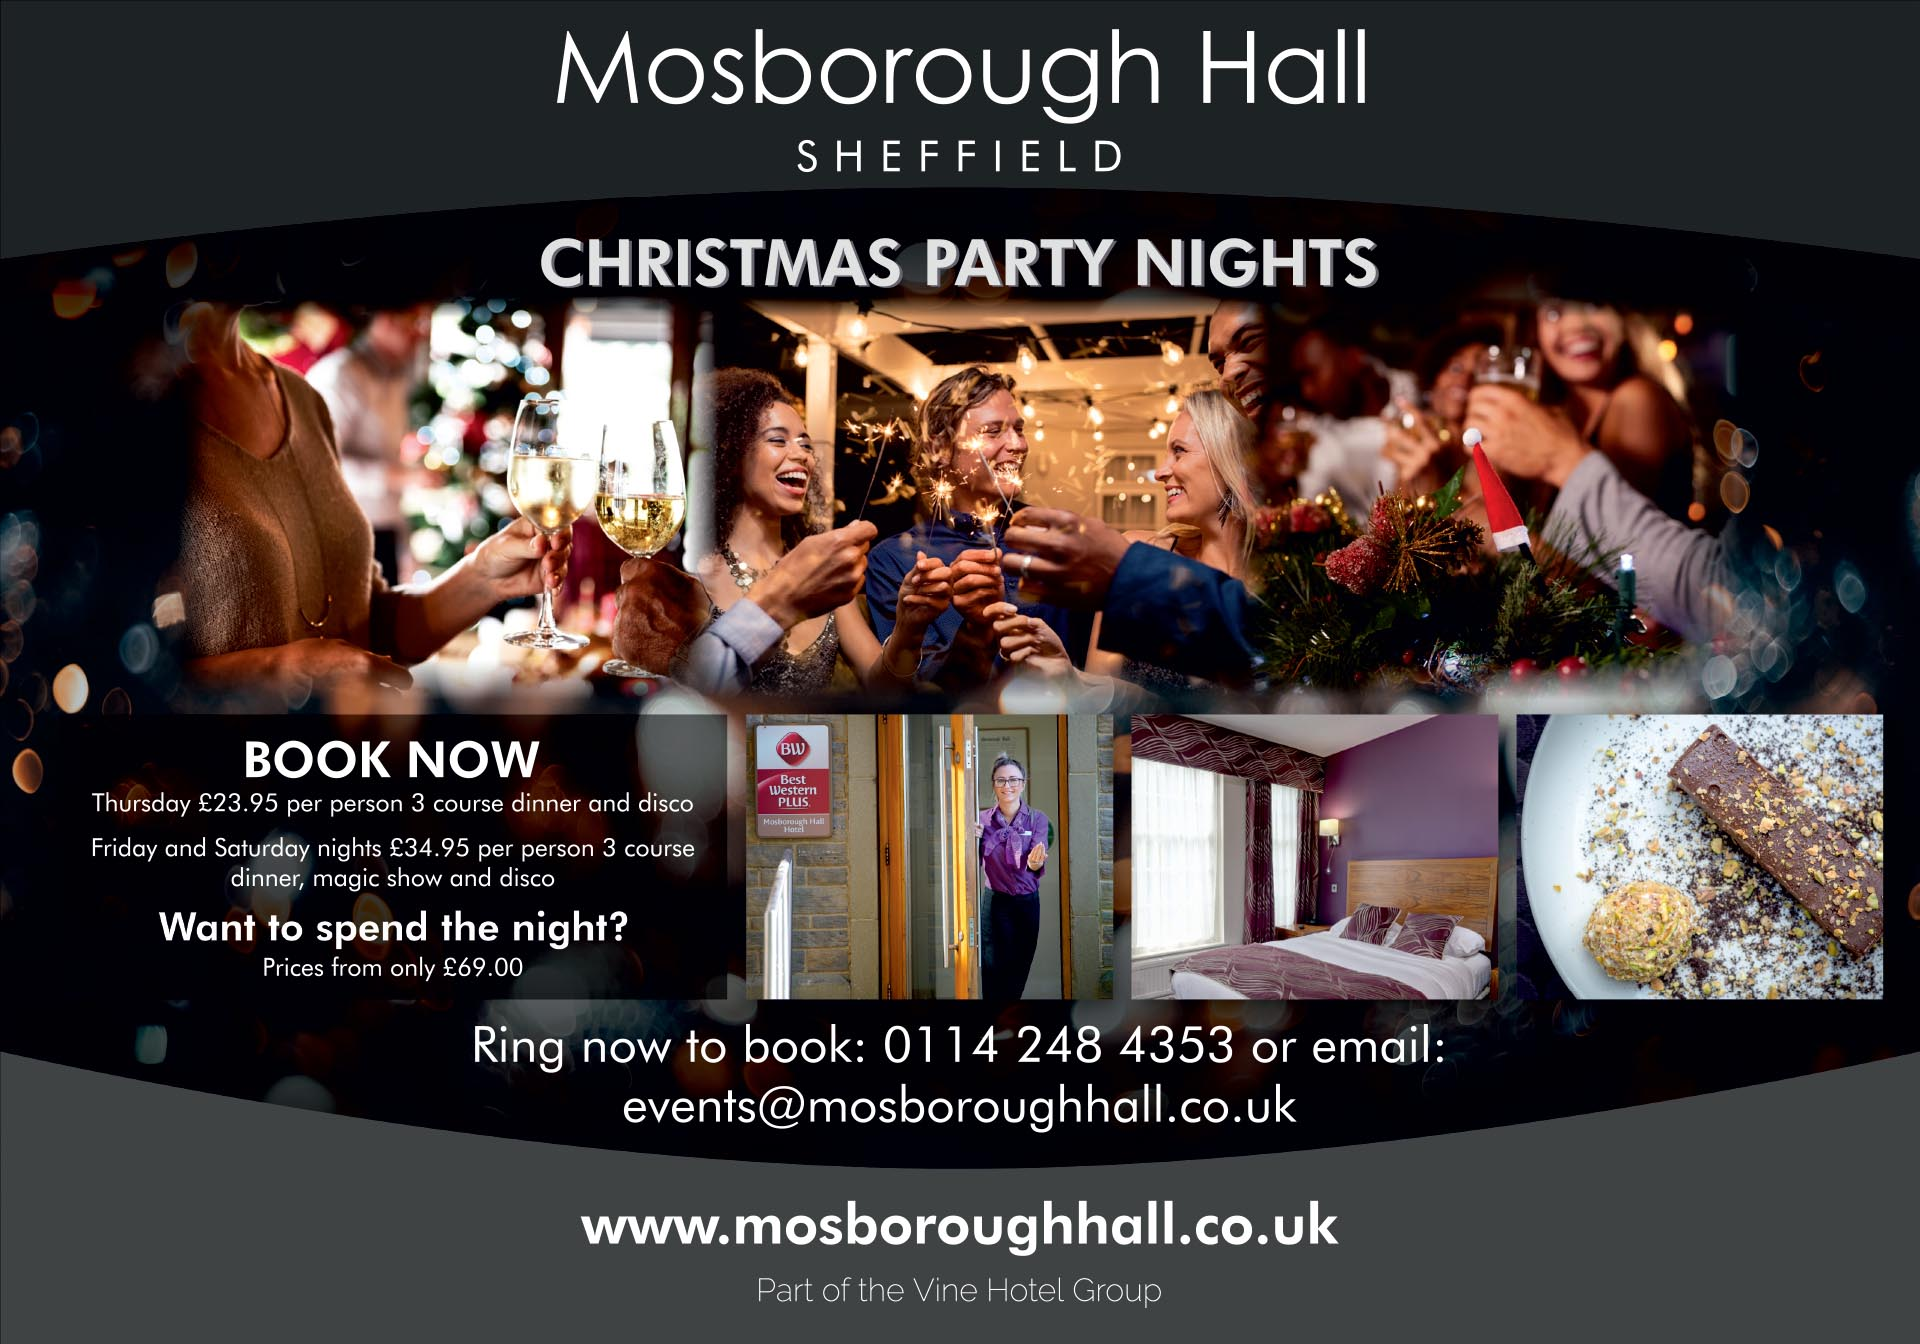 Derbyshire Life Half Page September Christmas Party Nights at Mosborough Hall